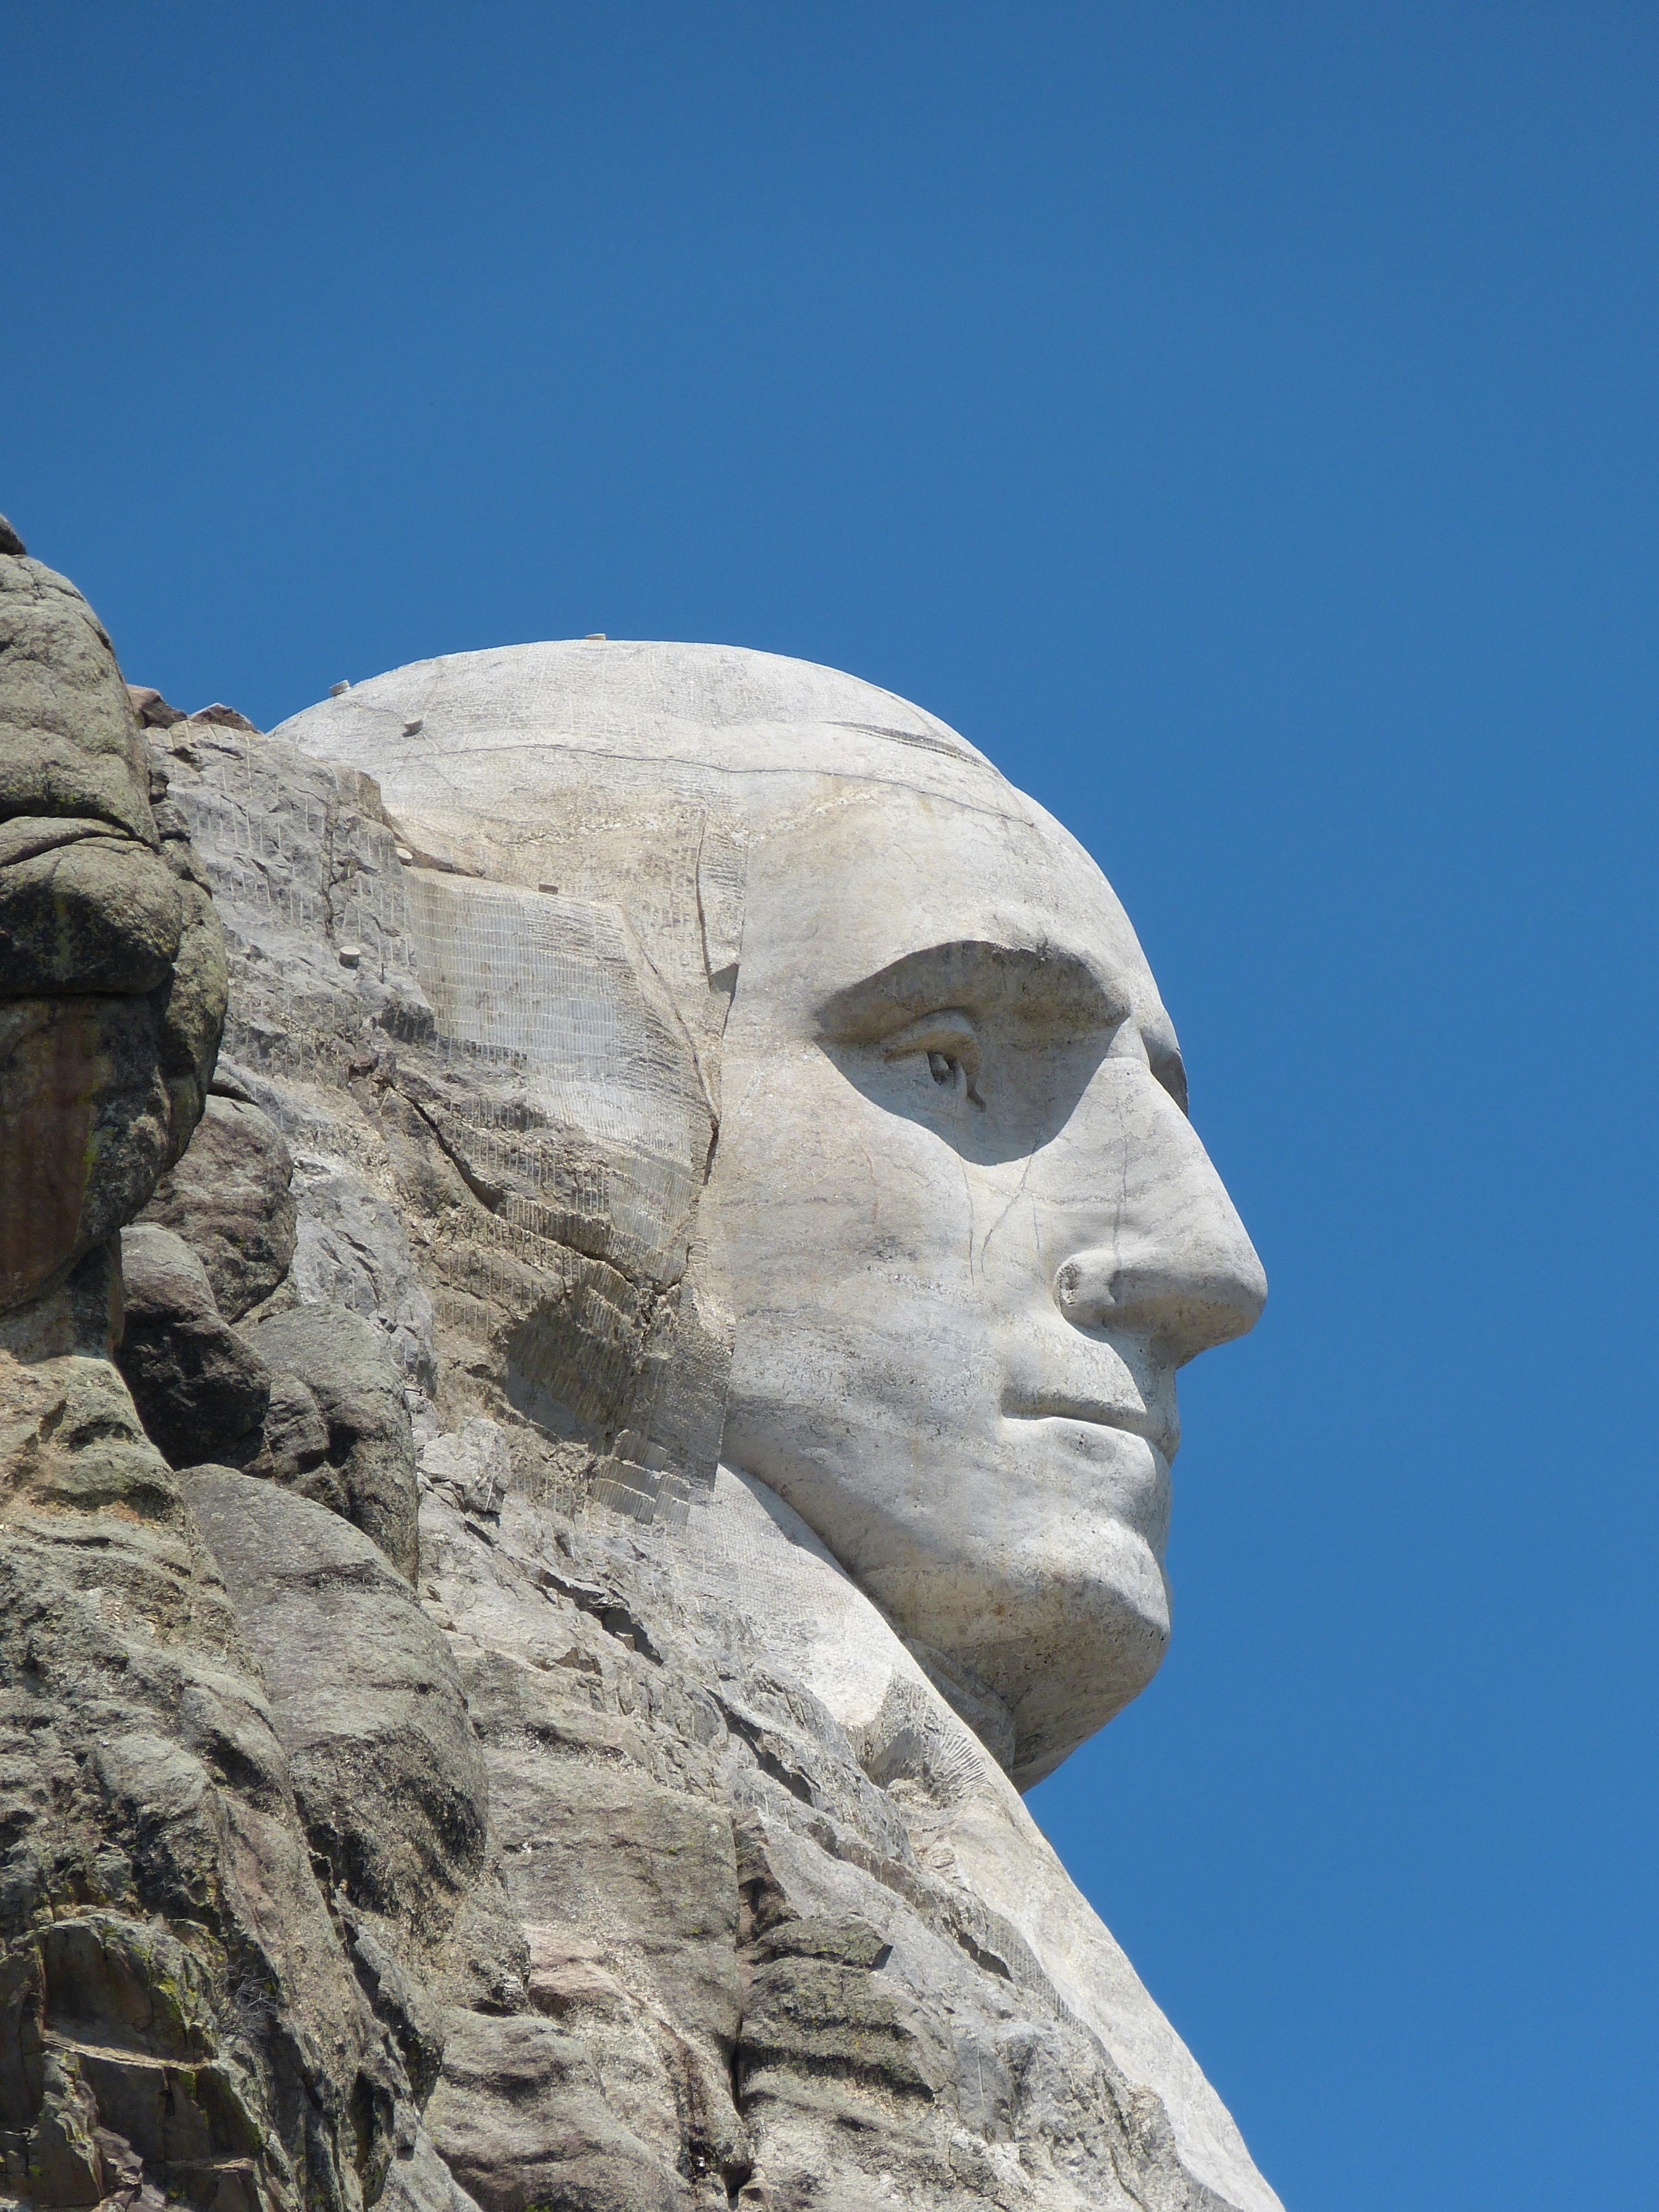 The Great American Road Trip Mount Rushmore